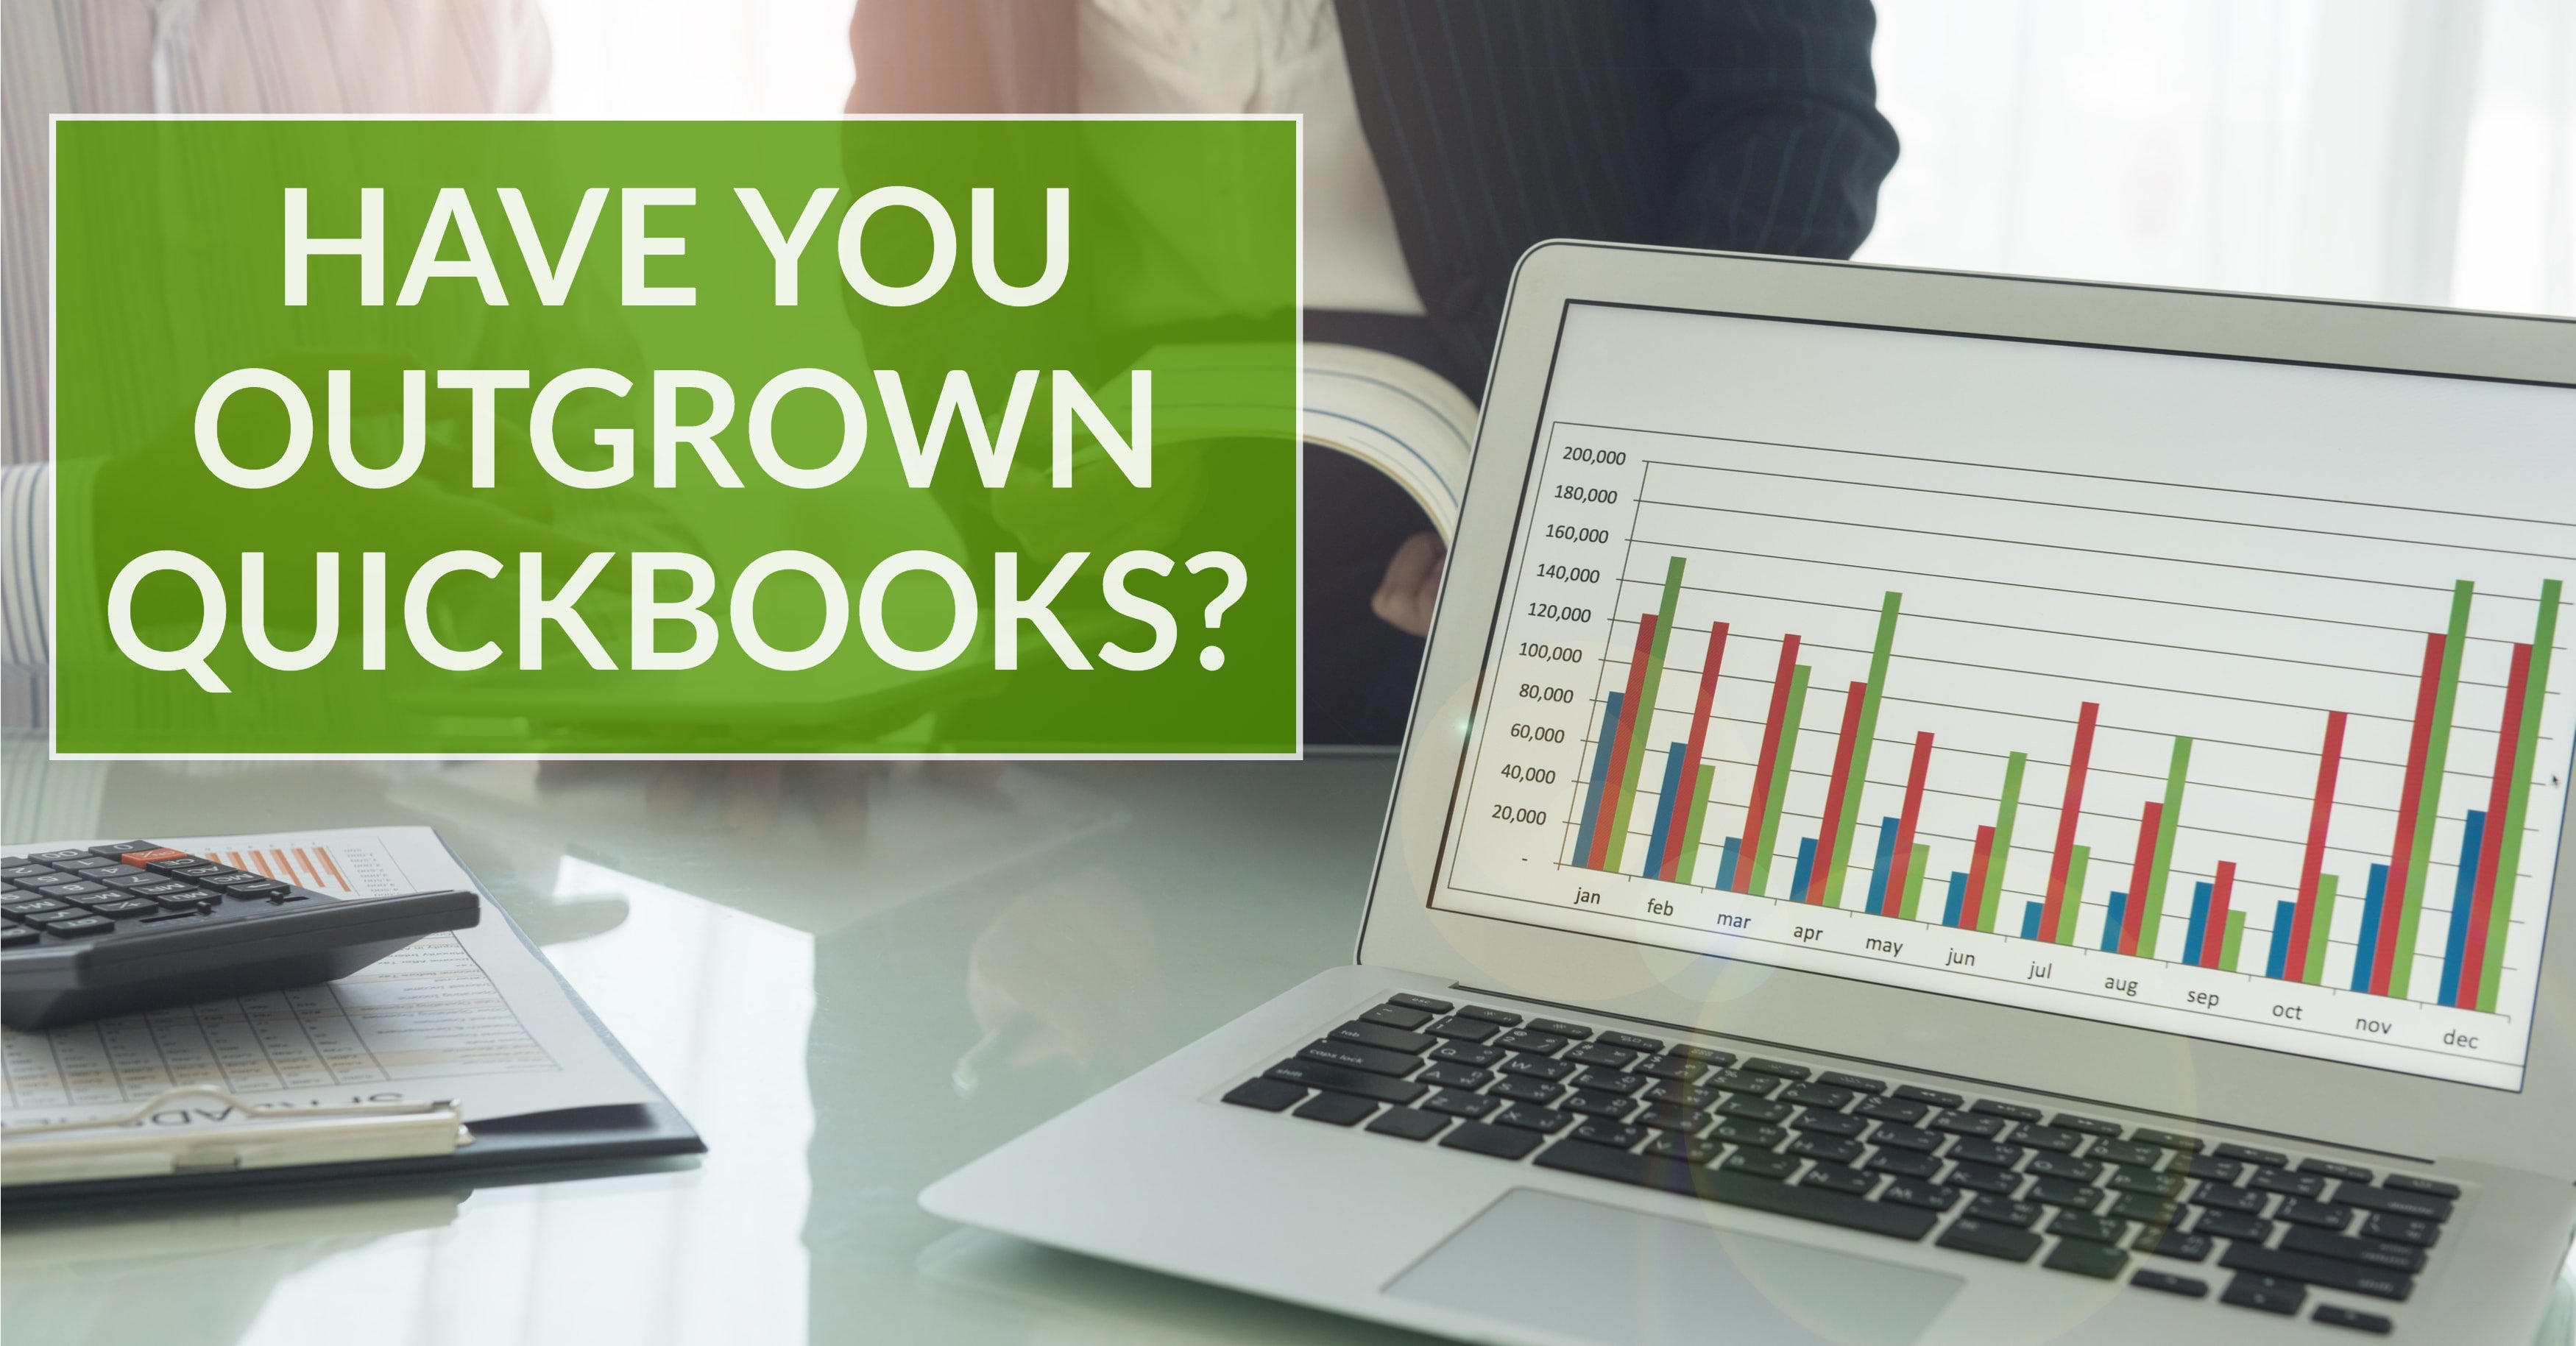 Outgrown QuickBooks